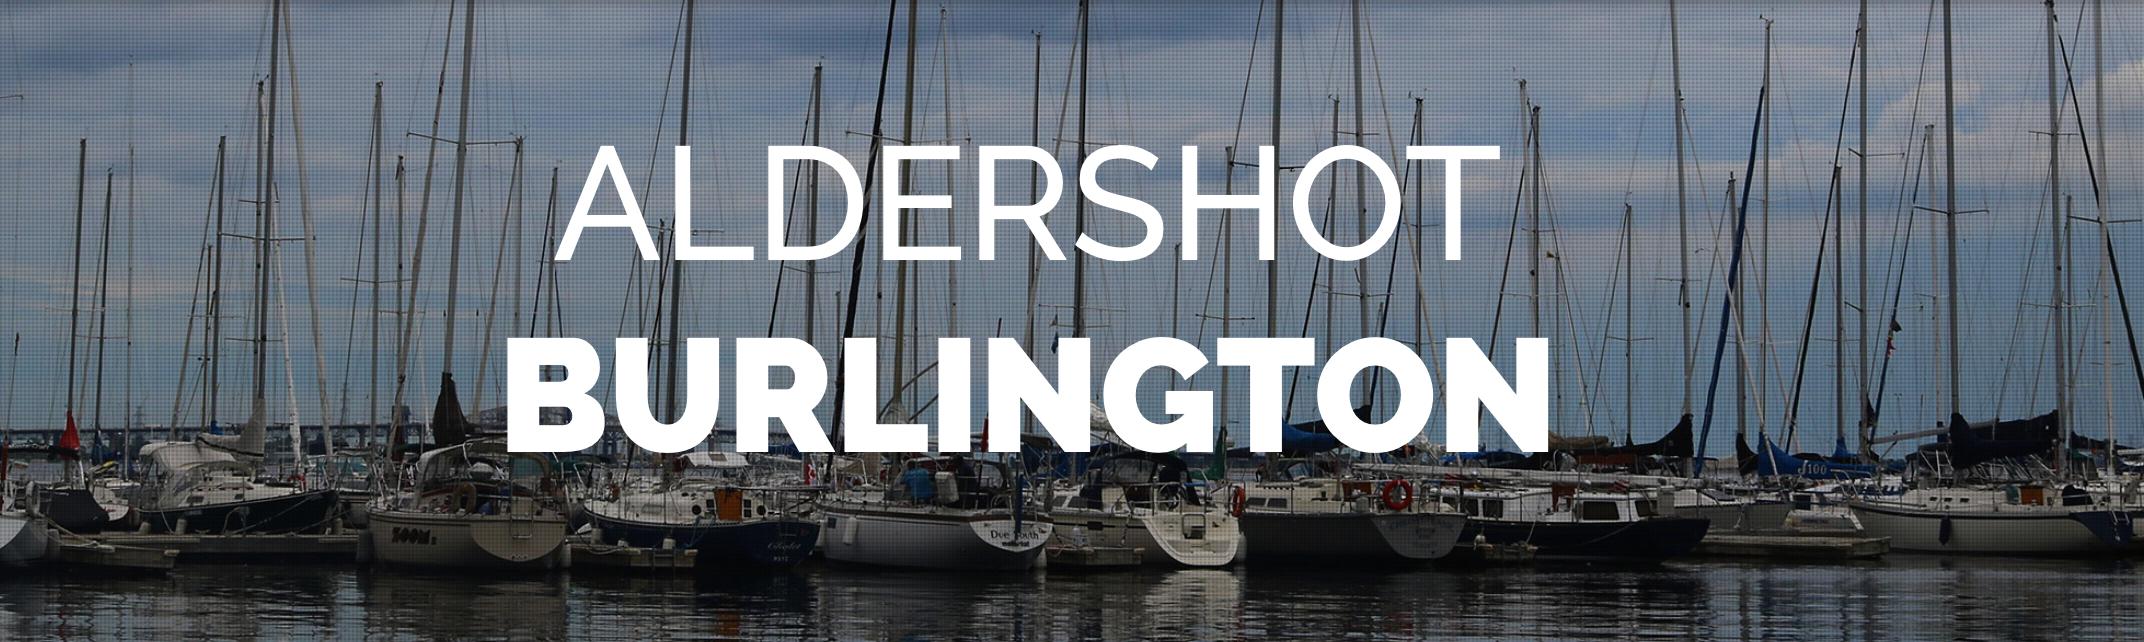 Aldershot Burlington